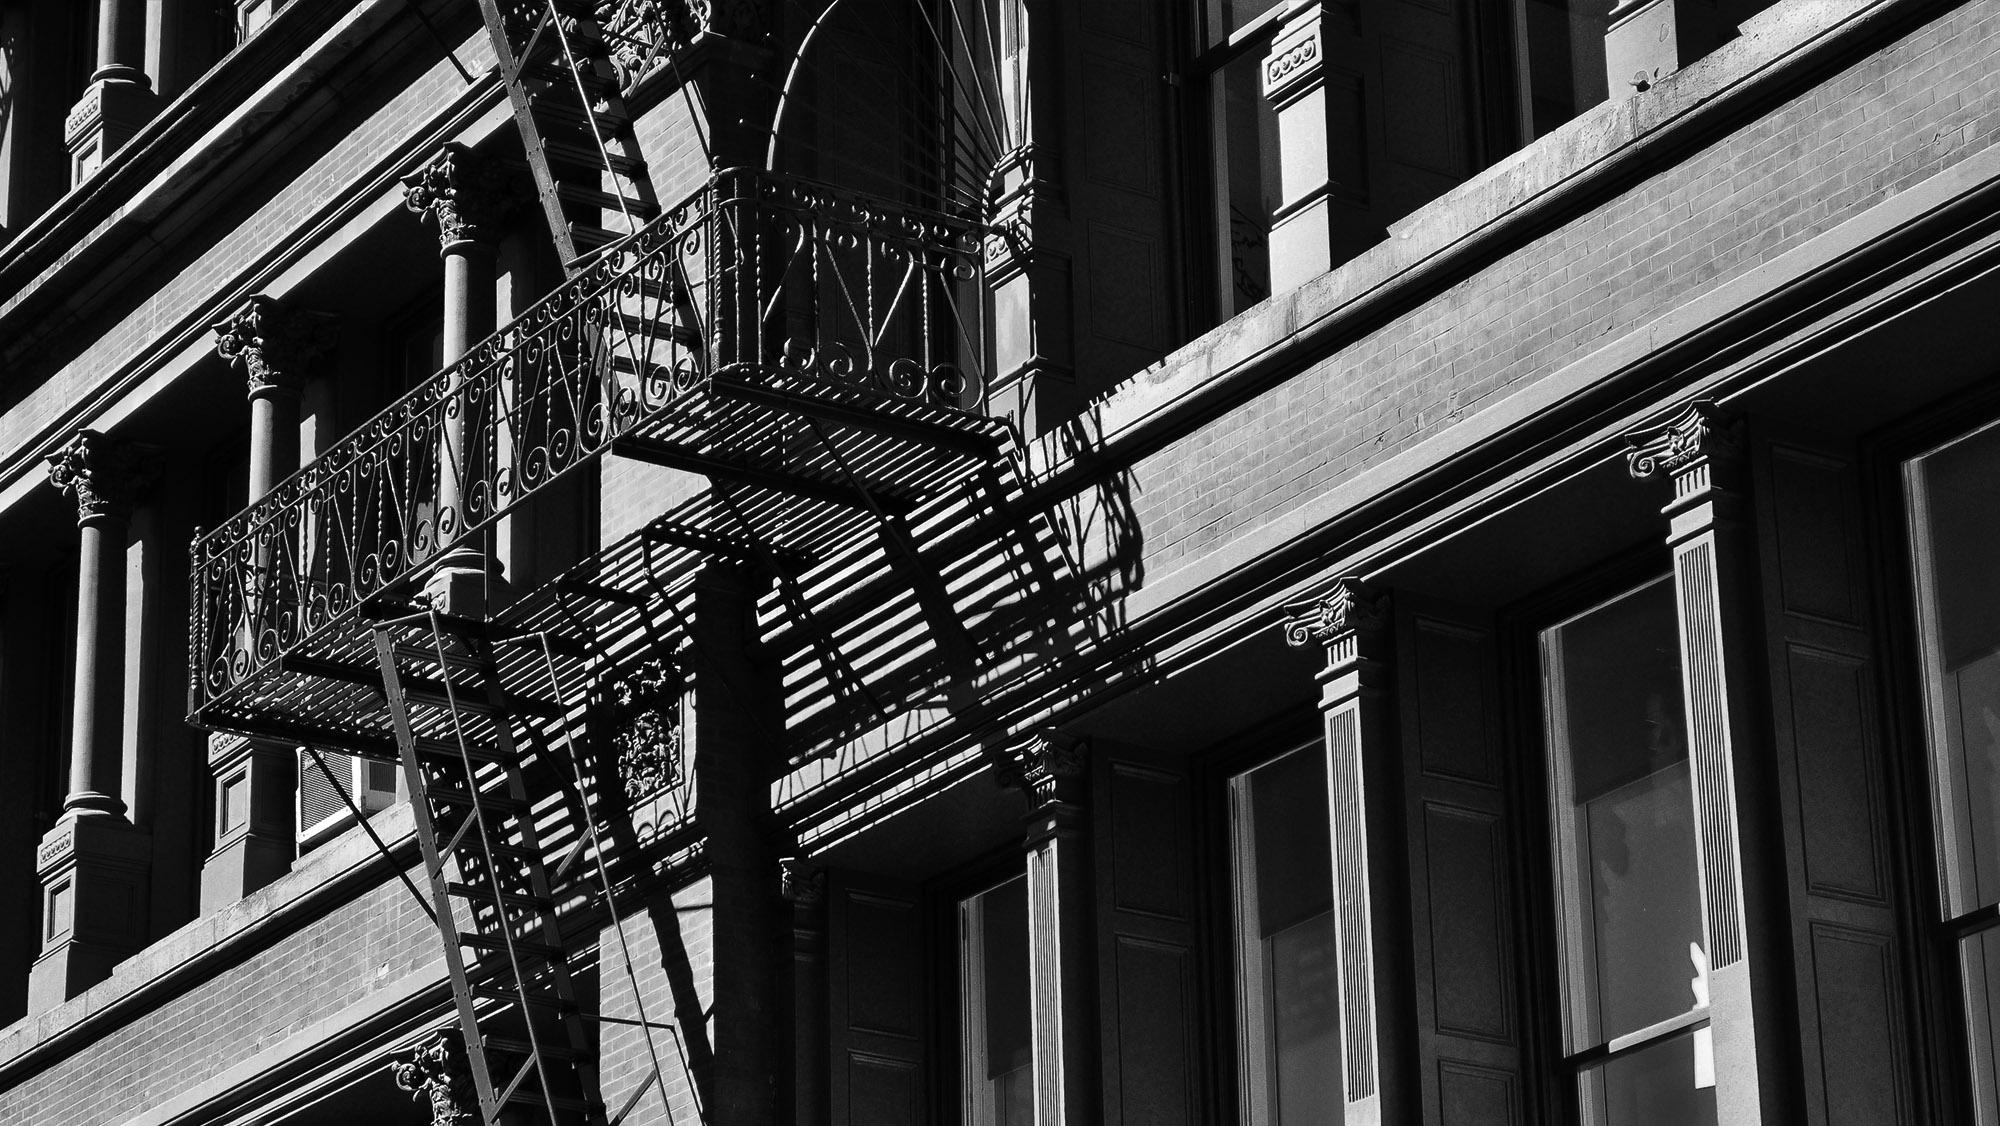 Bowery, Manhattan, New York